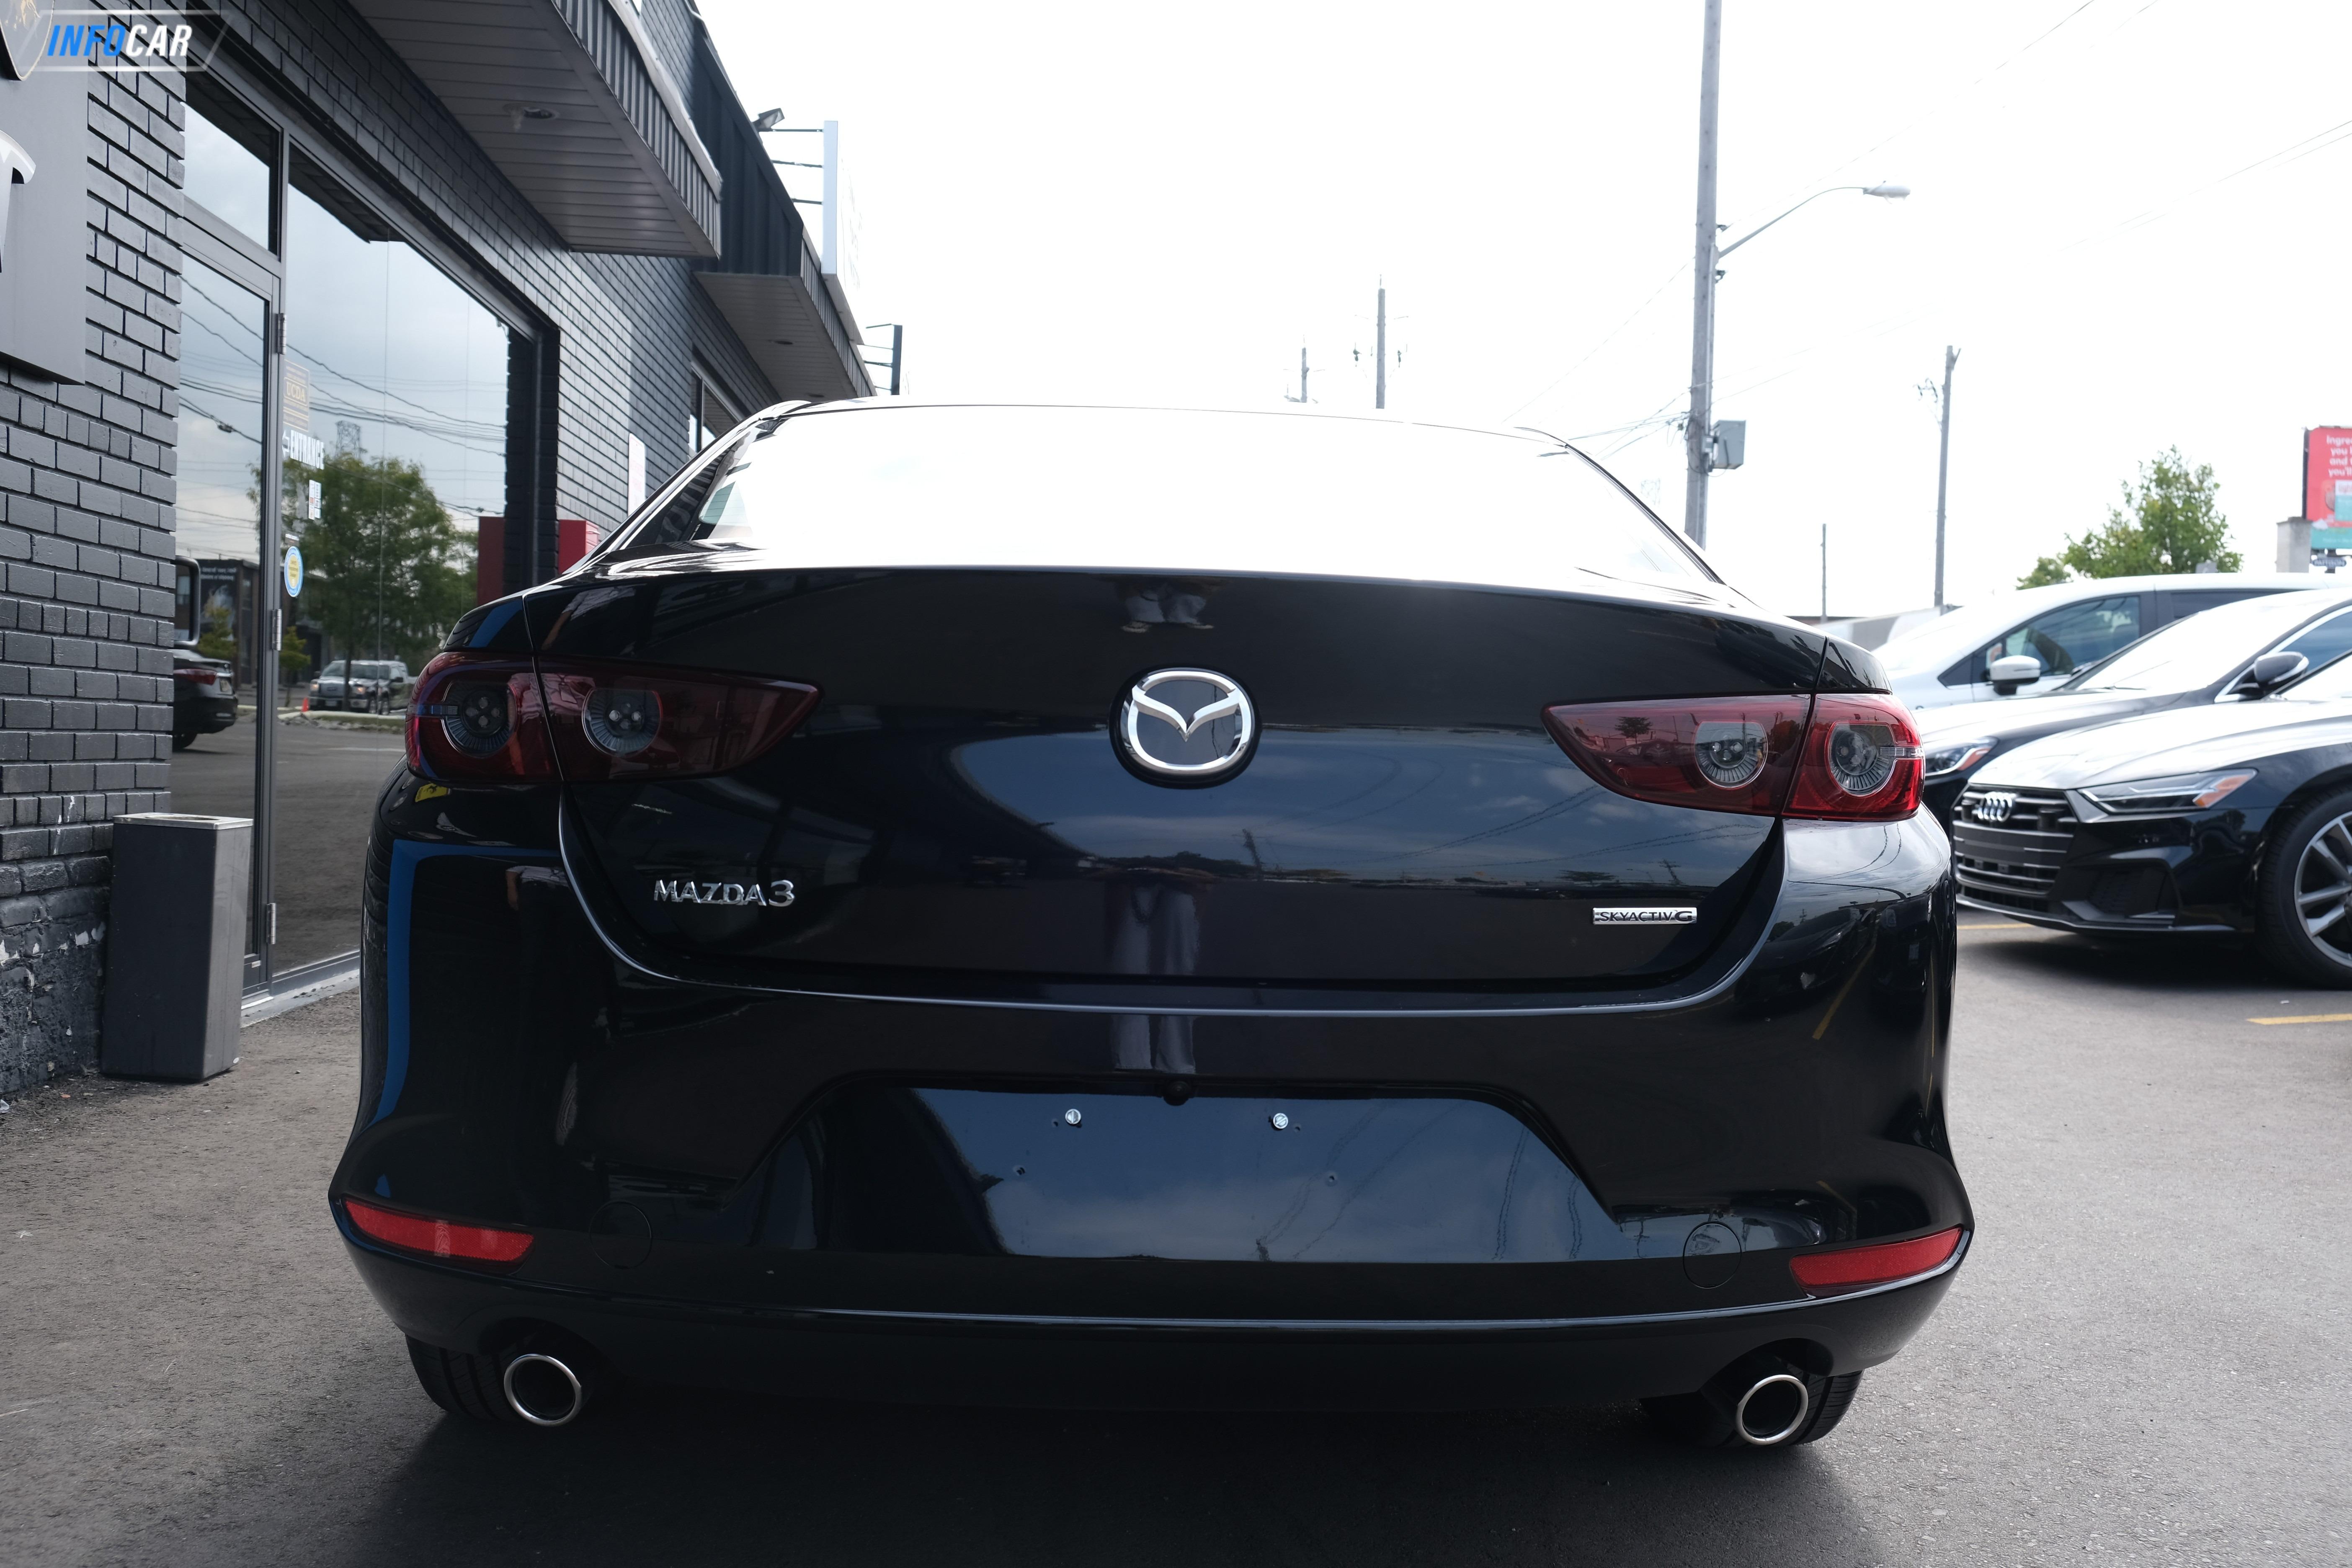 2020 Mazda MAZDA3 gx - INFOCAR - Toronto's Most Comprehensive New and Used Auto Trading Platform